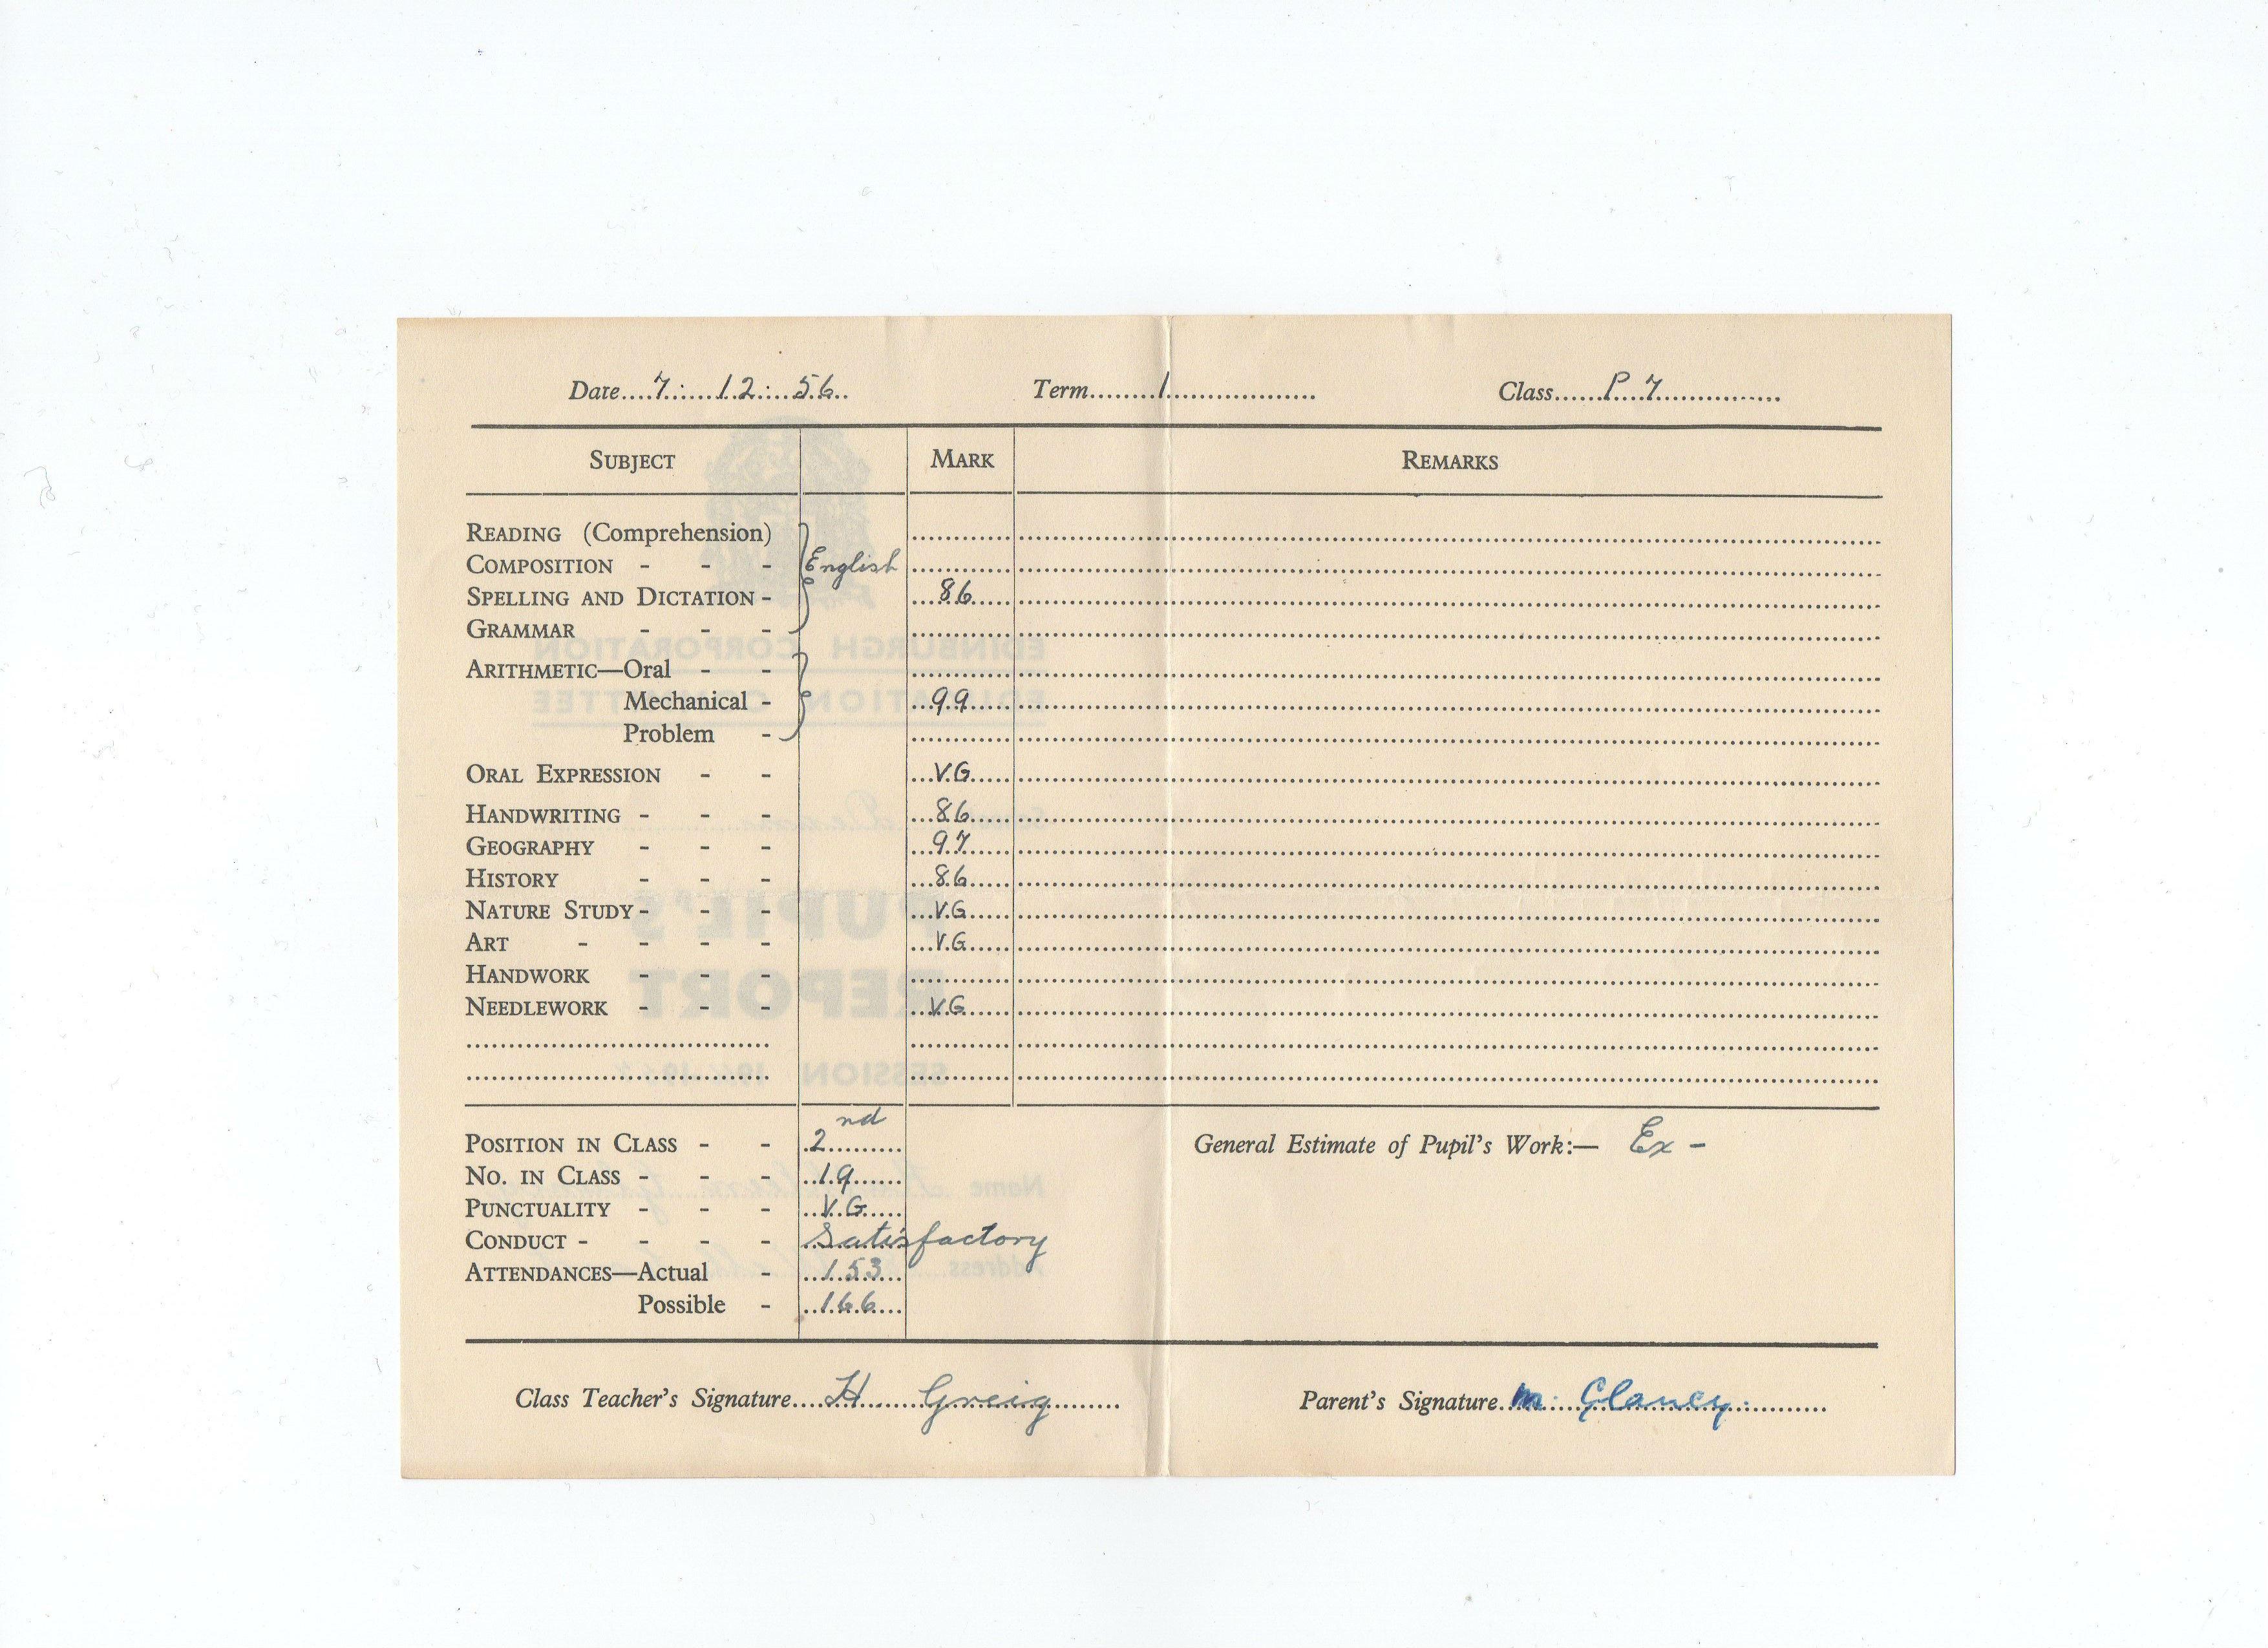 Kathleen Glancy's P7 Pupil's report from Dean School